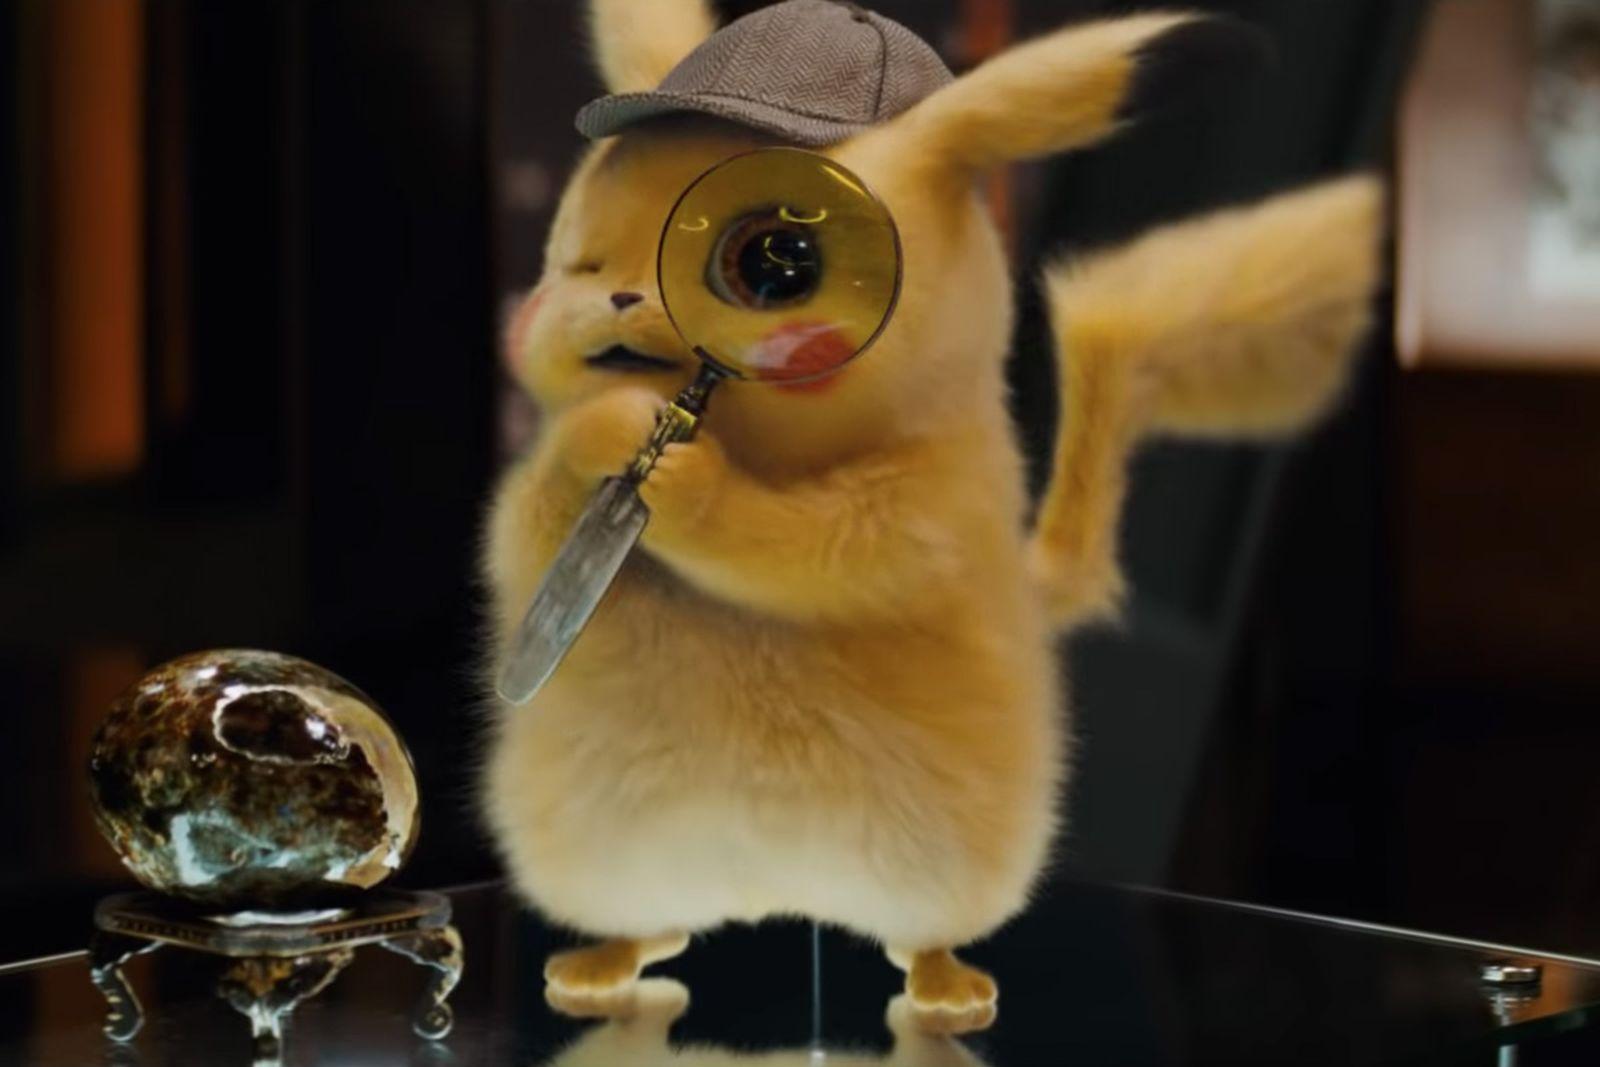 detective pikachu reactions Twitter reactions